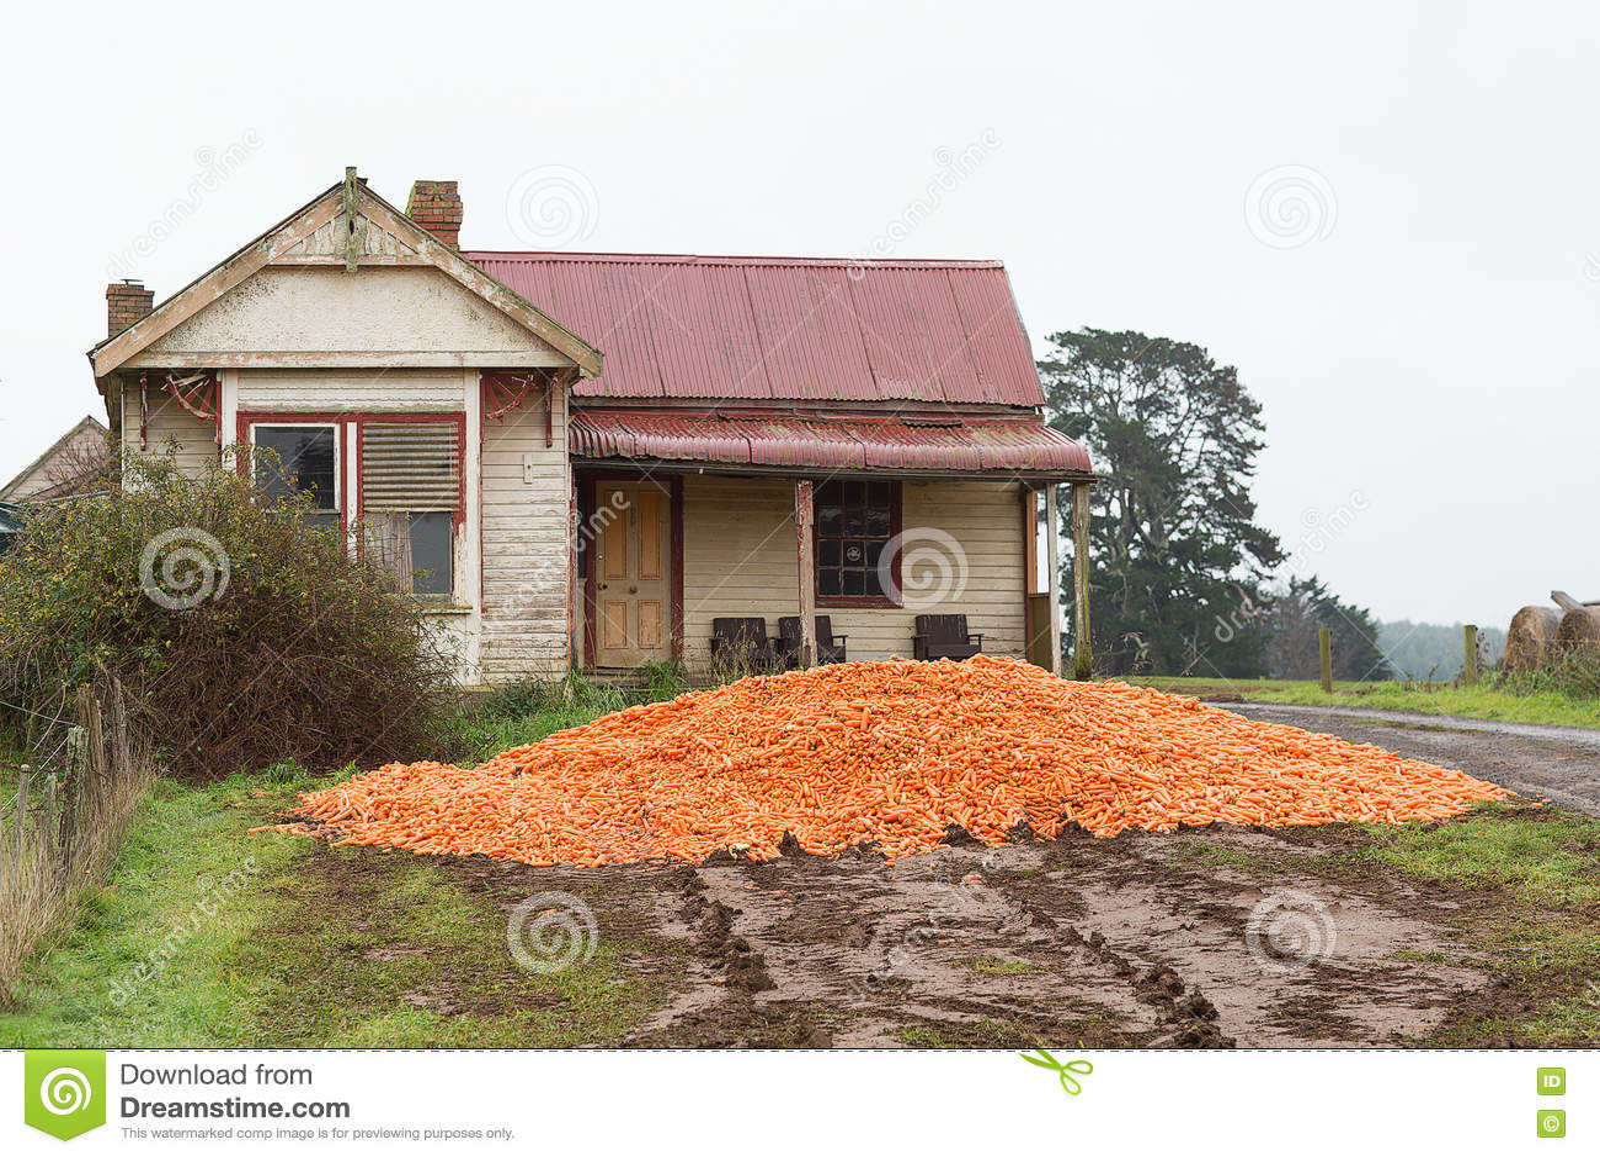 Dumped Carrot Crop Tasmania